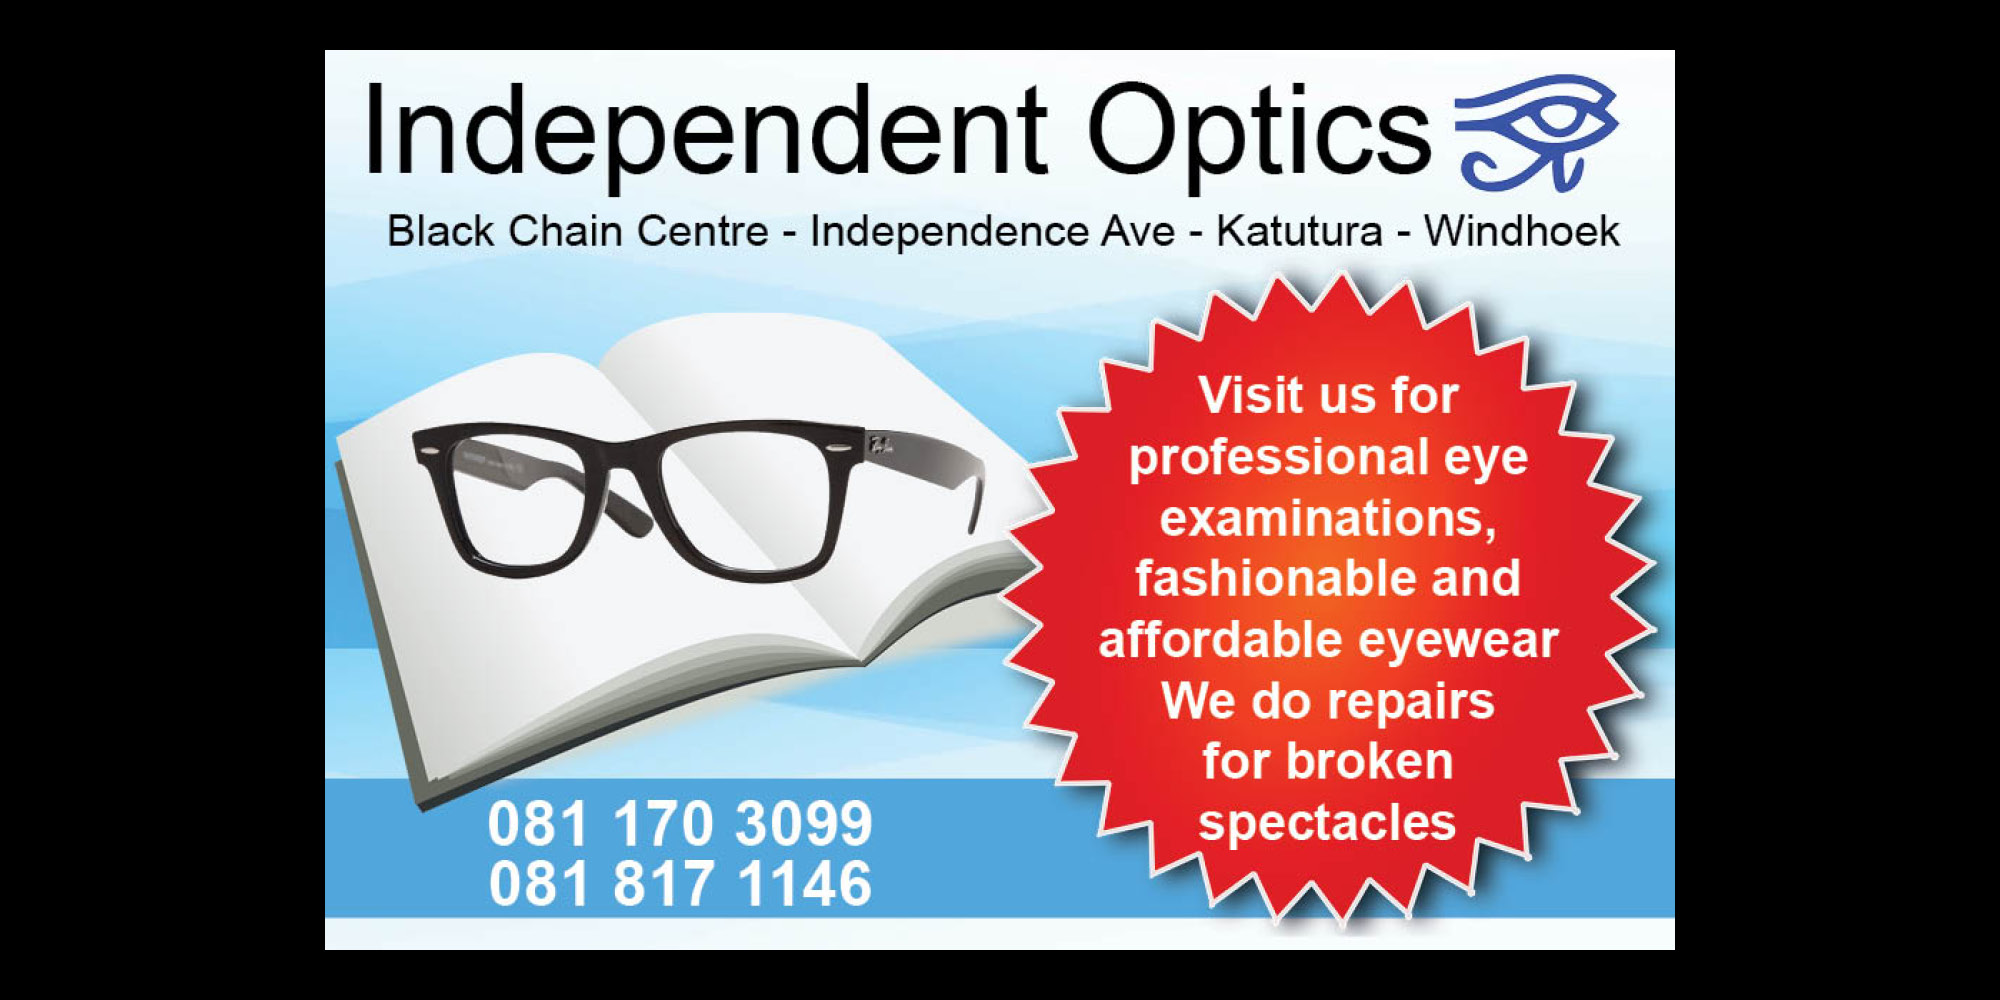 Independent Optics